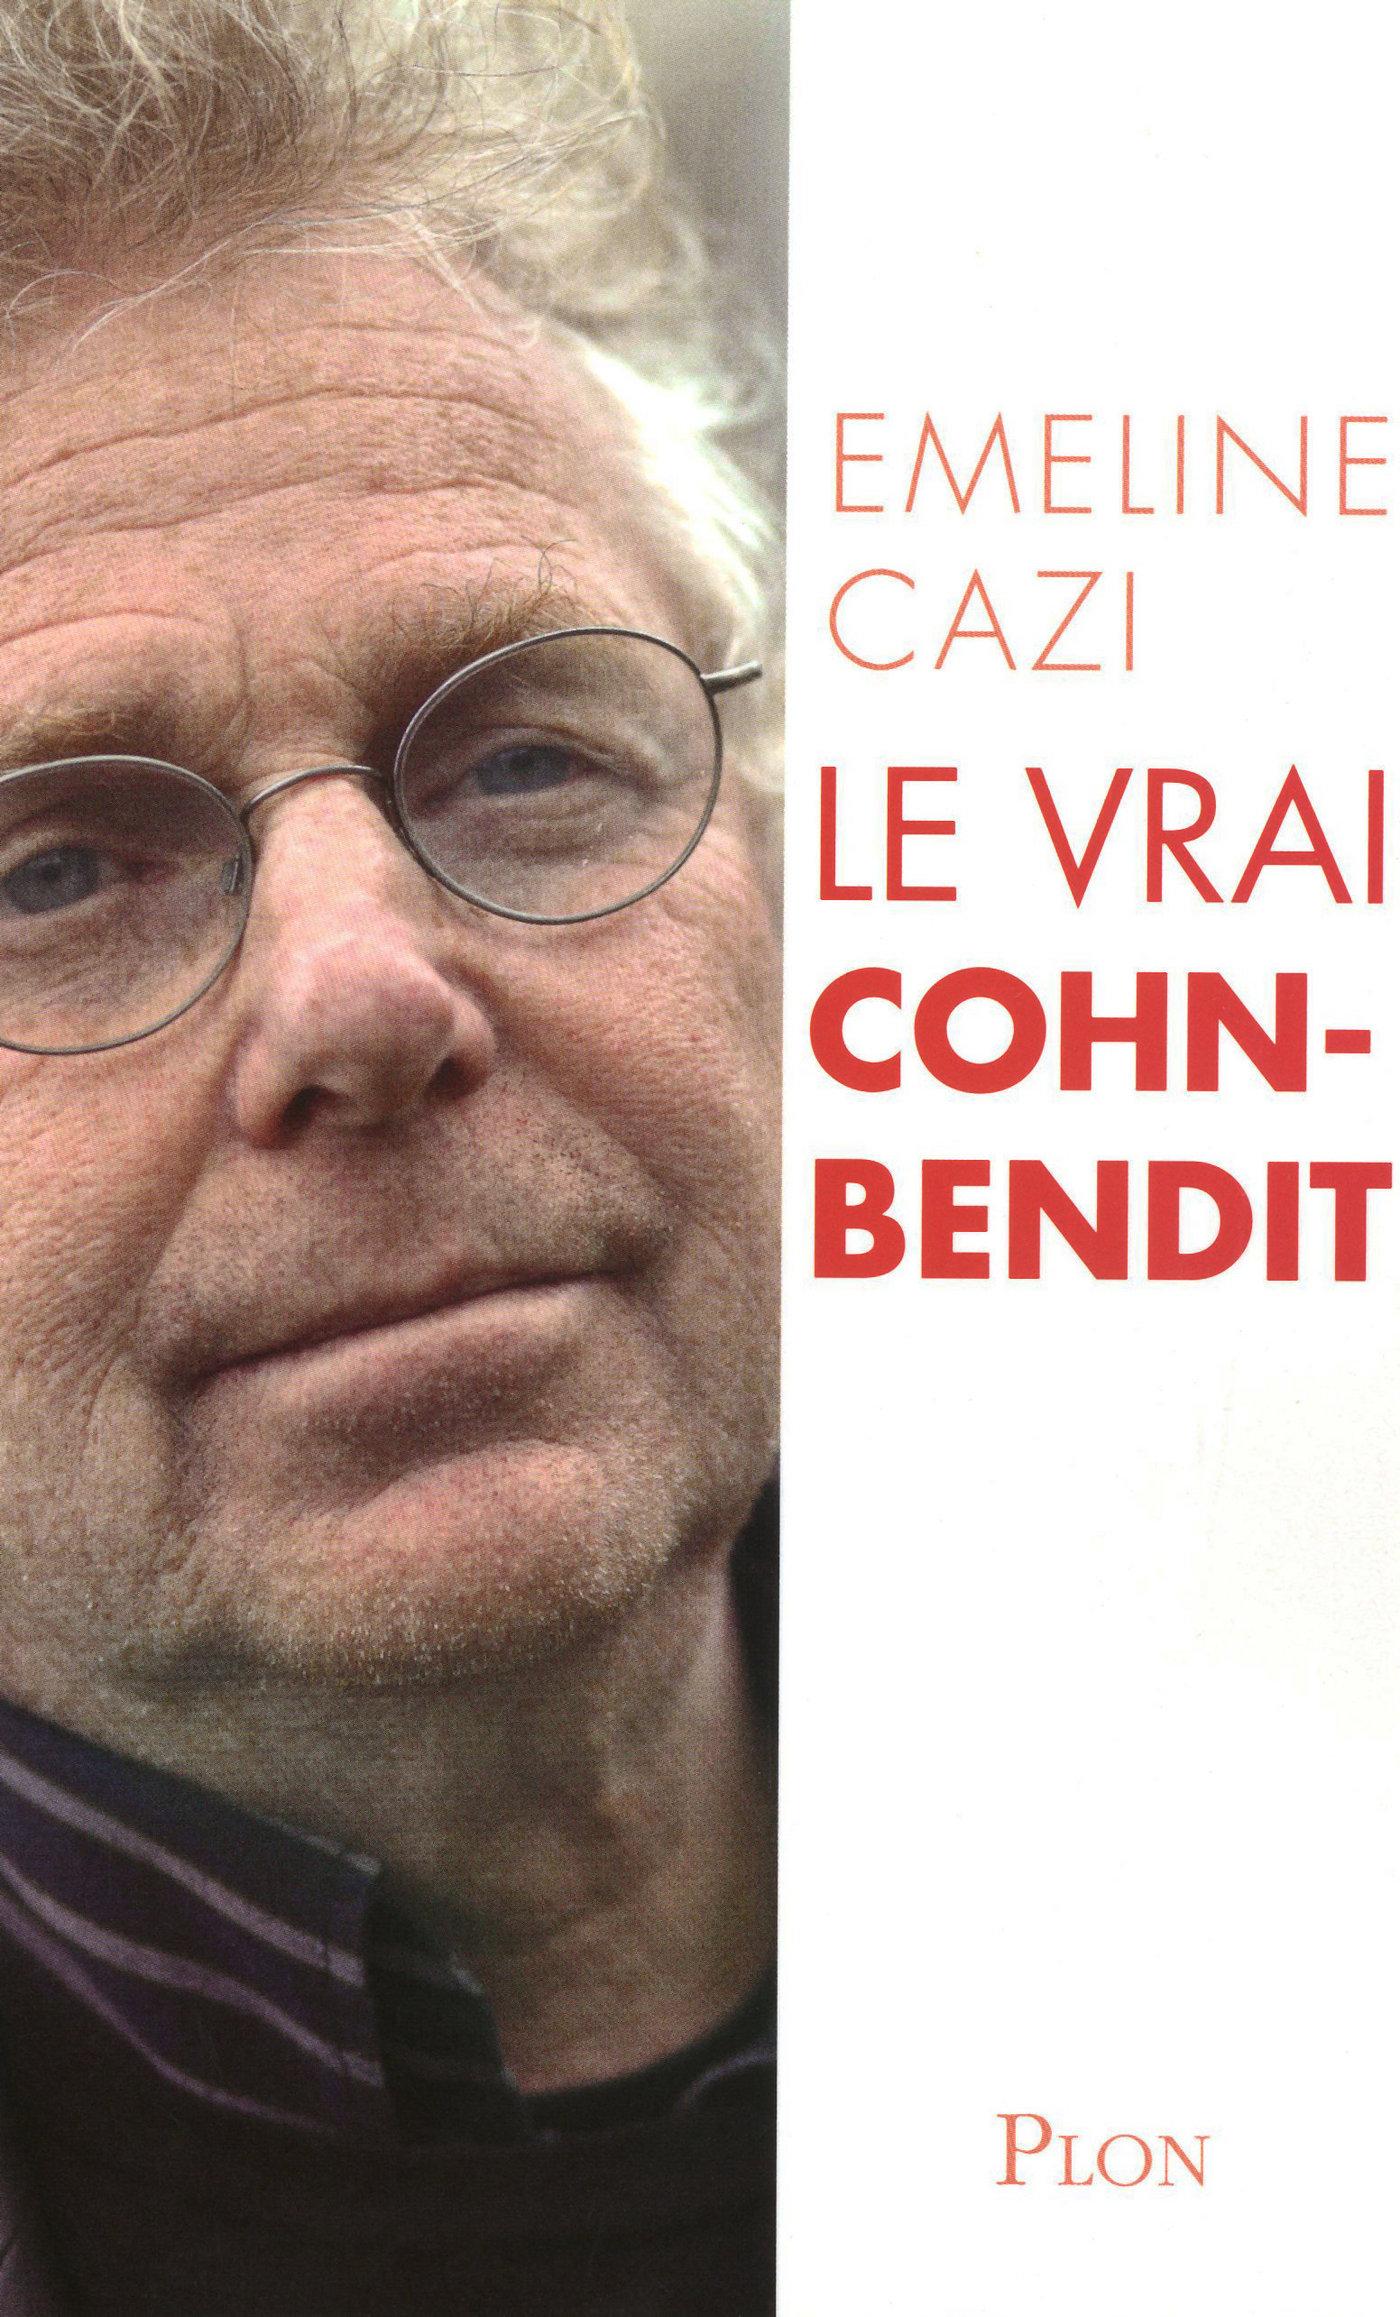 Le vrai Cohn Bendit | CAZI, Emeline